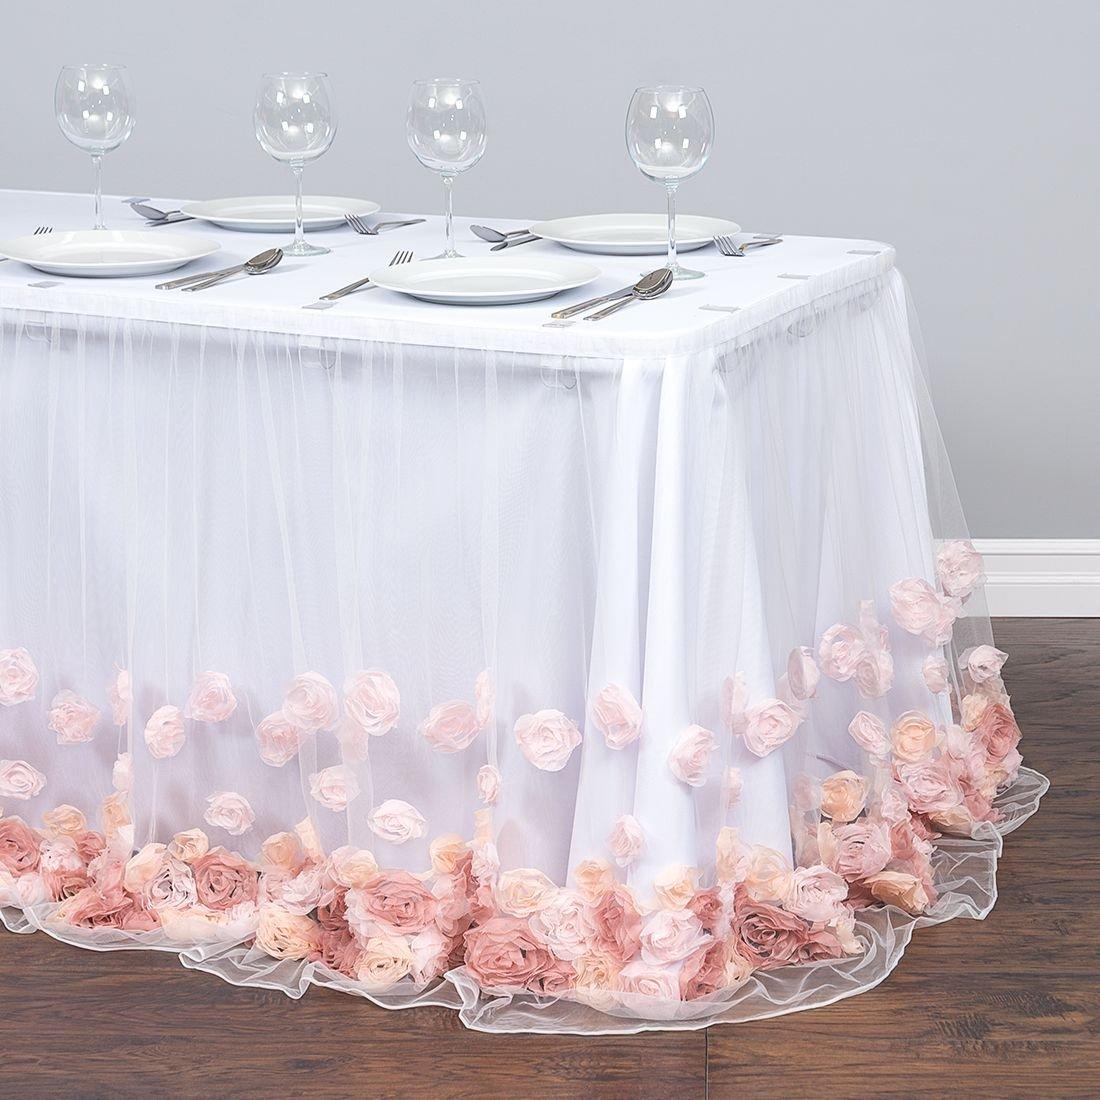 21 ft. Tulle Rose Table Skirt Blush Pink